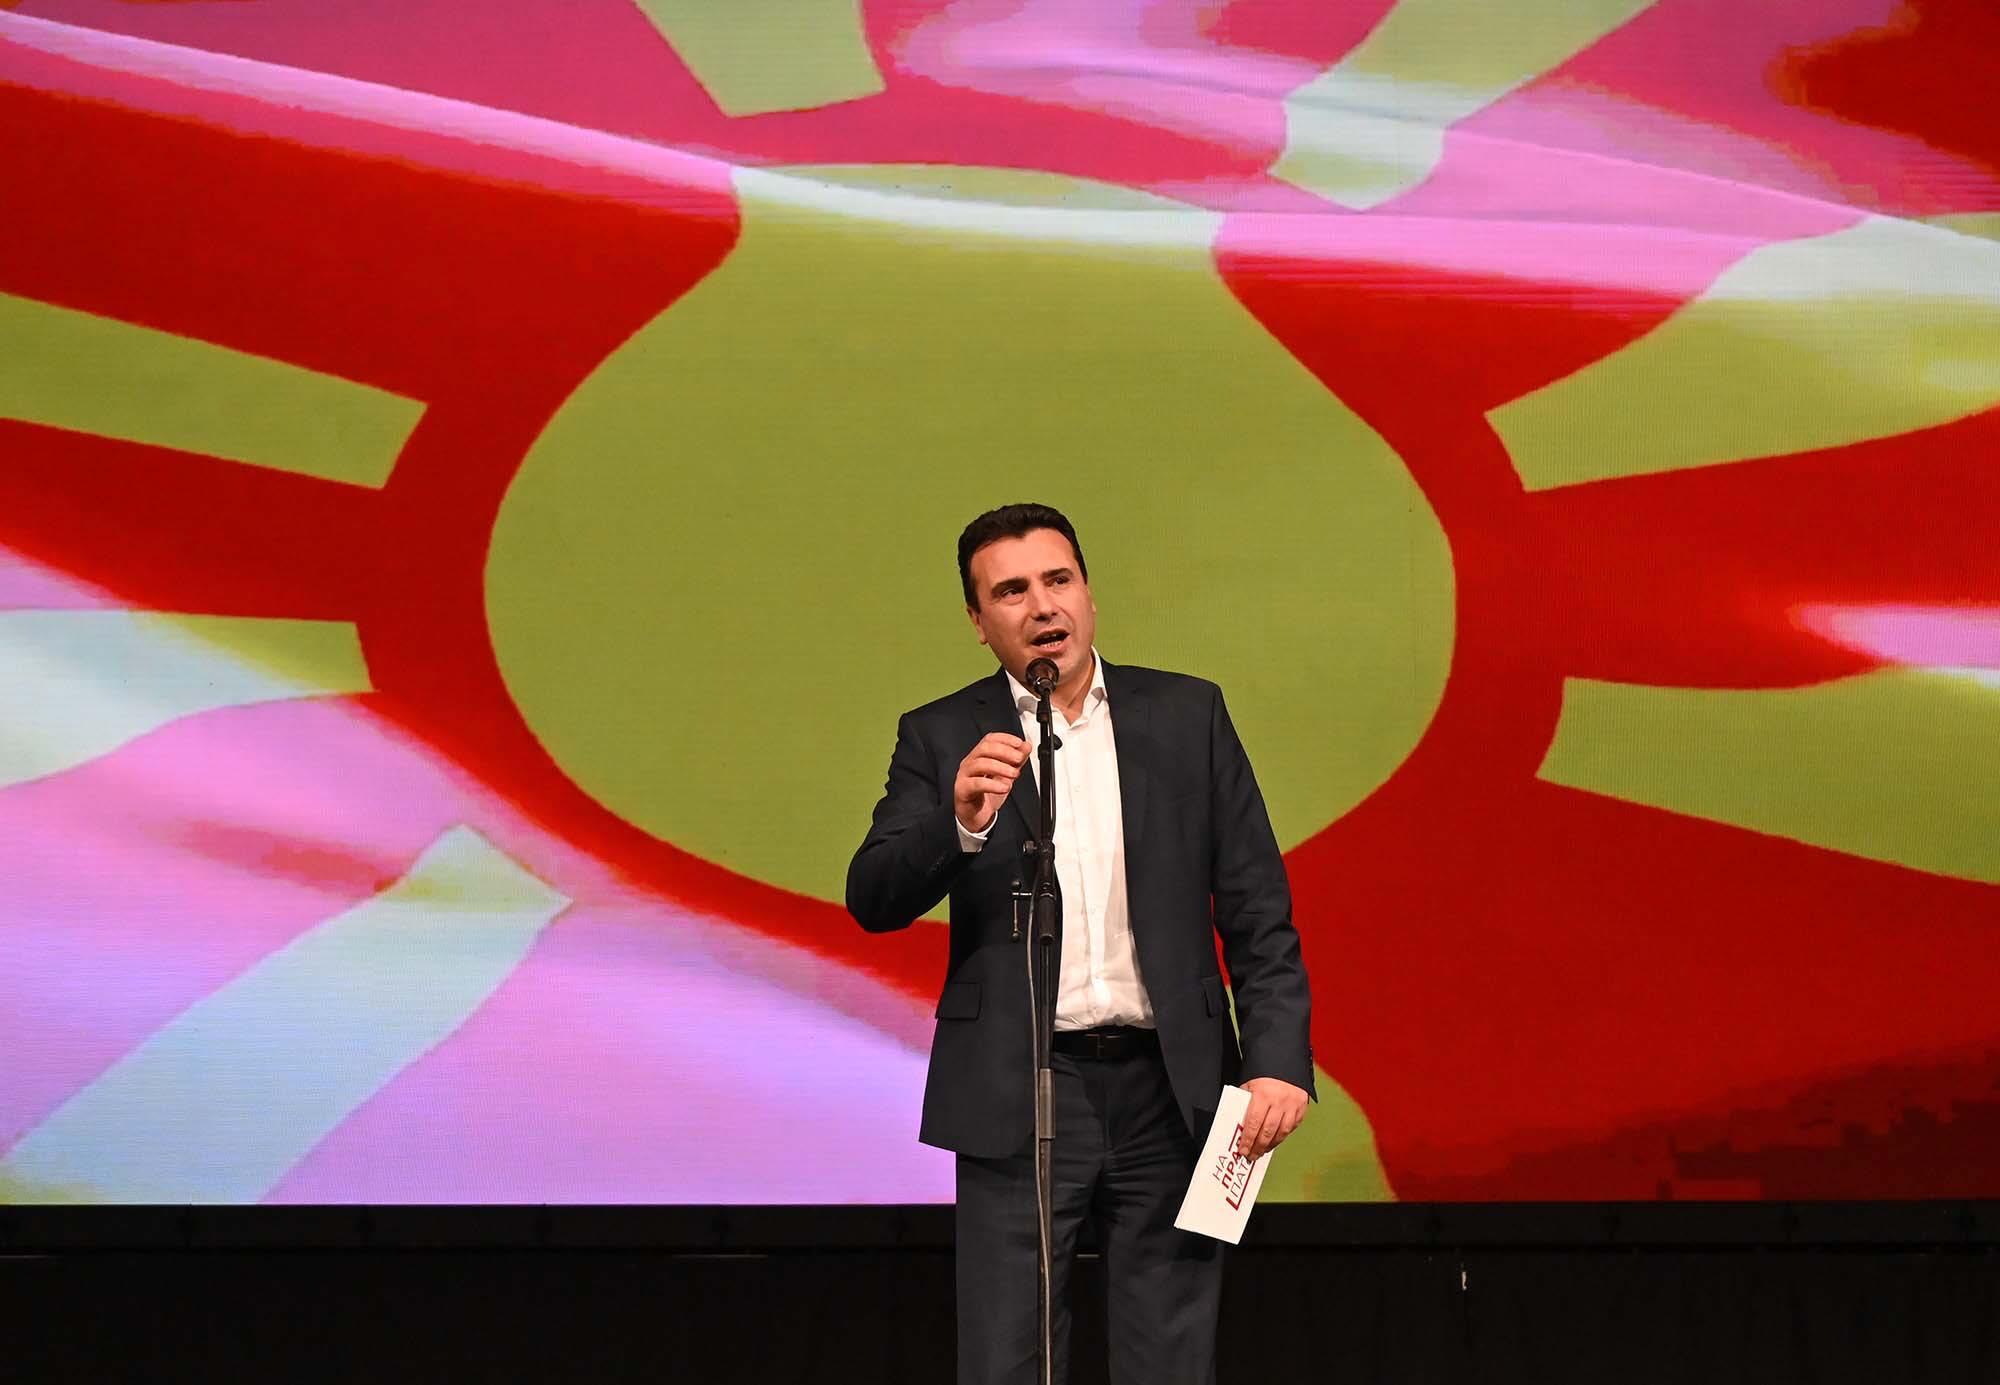 Zaev: Η Βόρεια Μακεδονία θα γίνει μέλος του ΝΑΤΟ τον Ιανουάριο